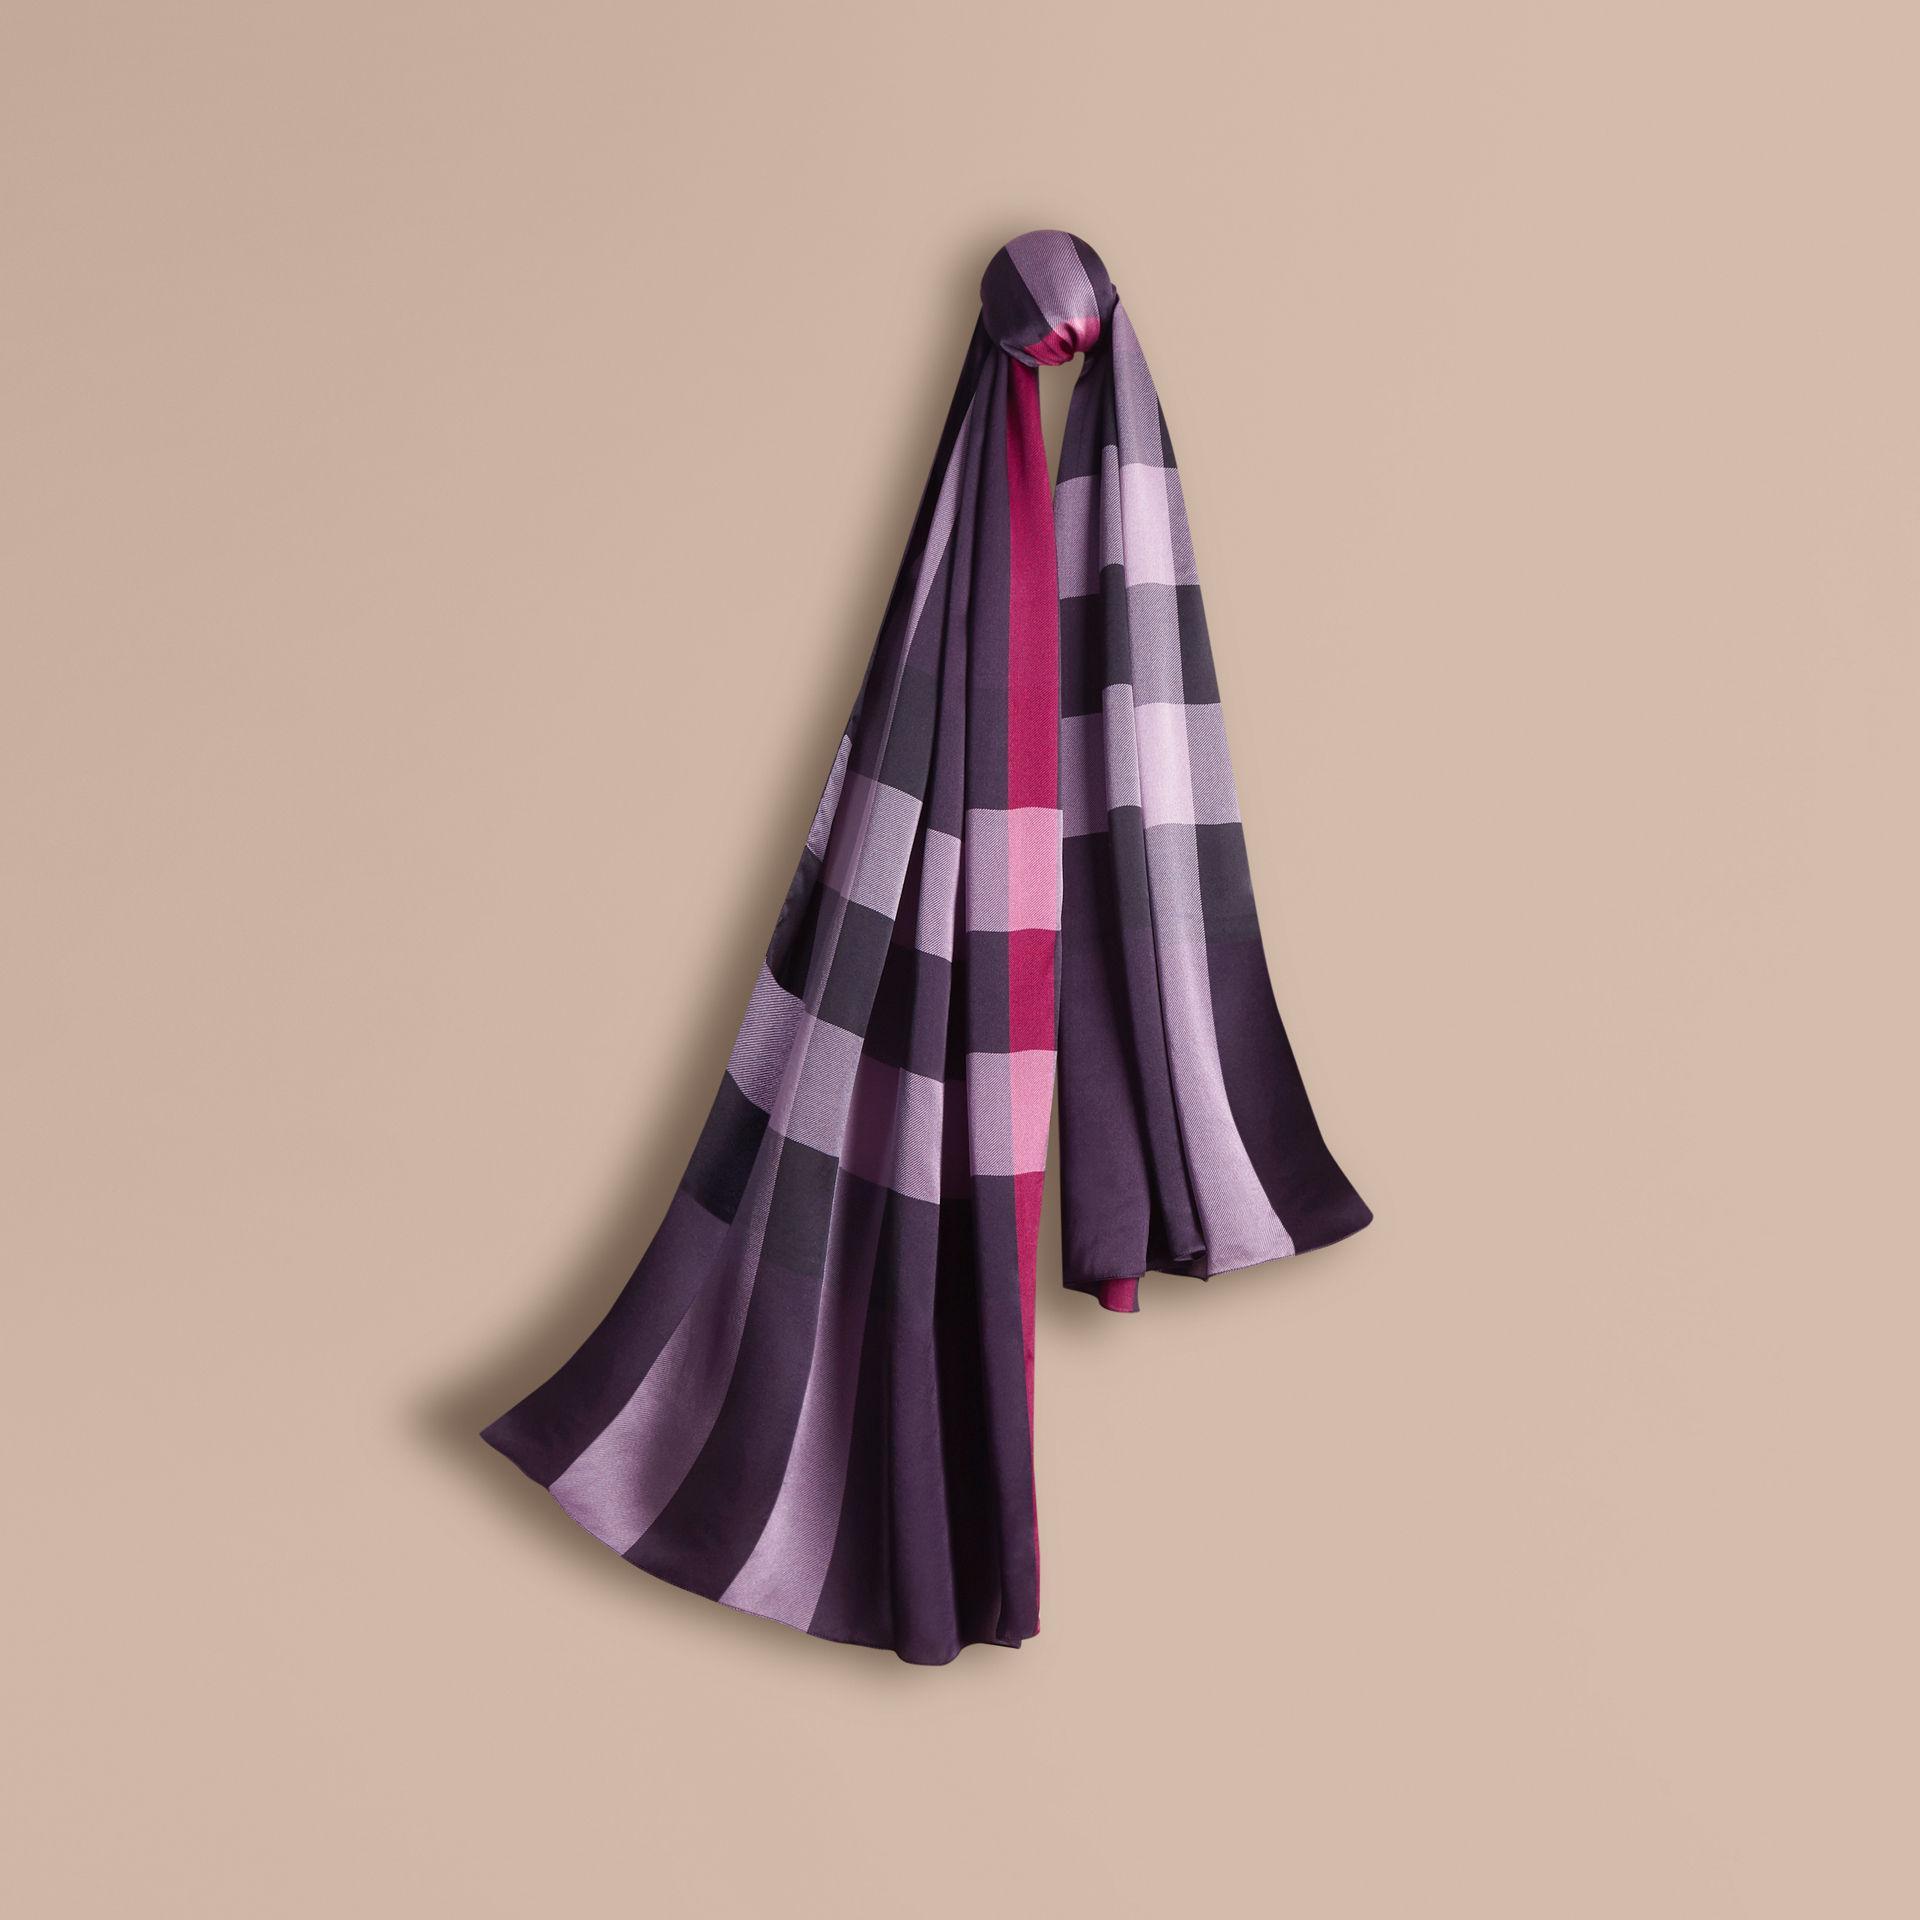 c95846218622 Lyst - Burberry Check Silk Satin Scarf Regency Purple in Purple